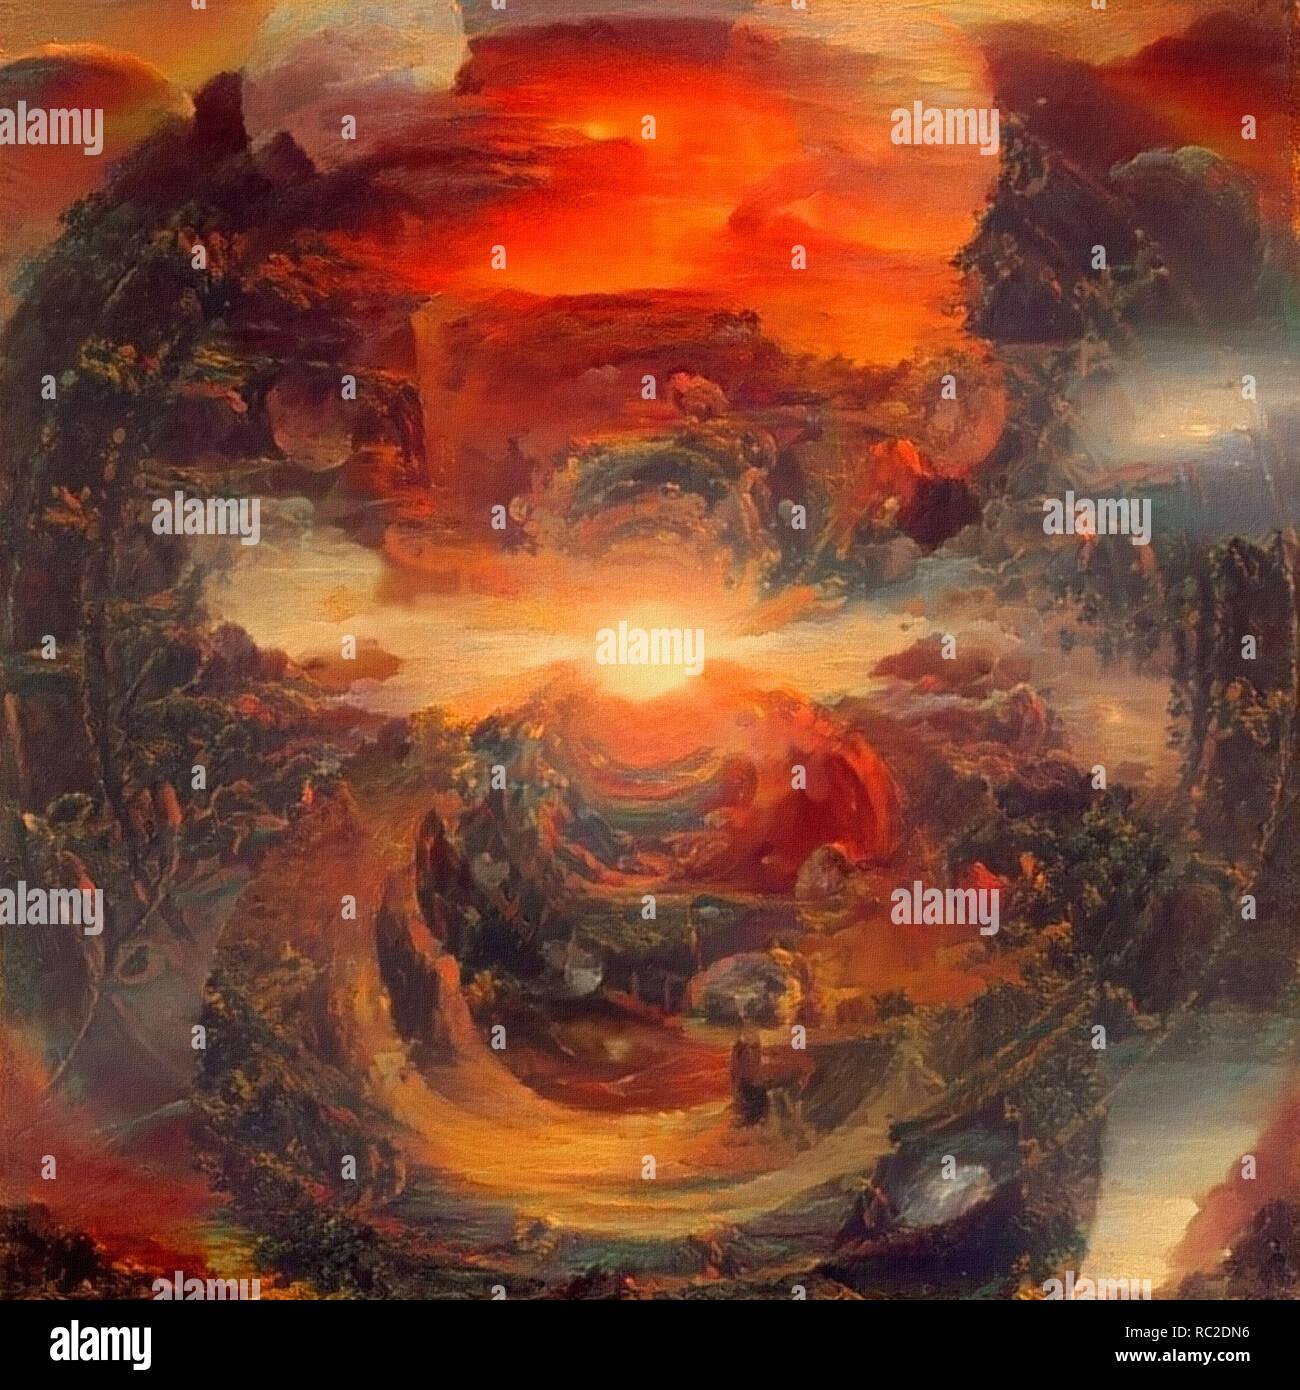 Abstract painting. Sunblast Armageddon - Stock Image